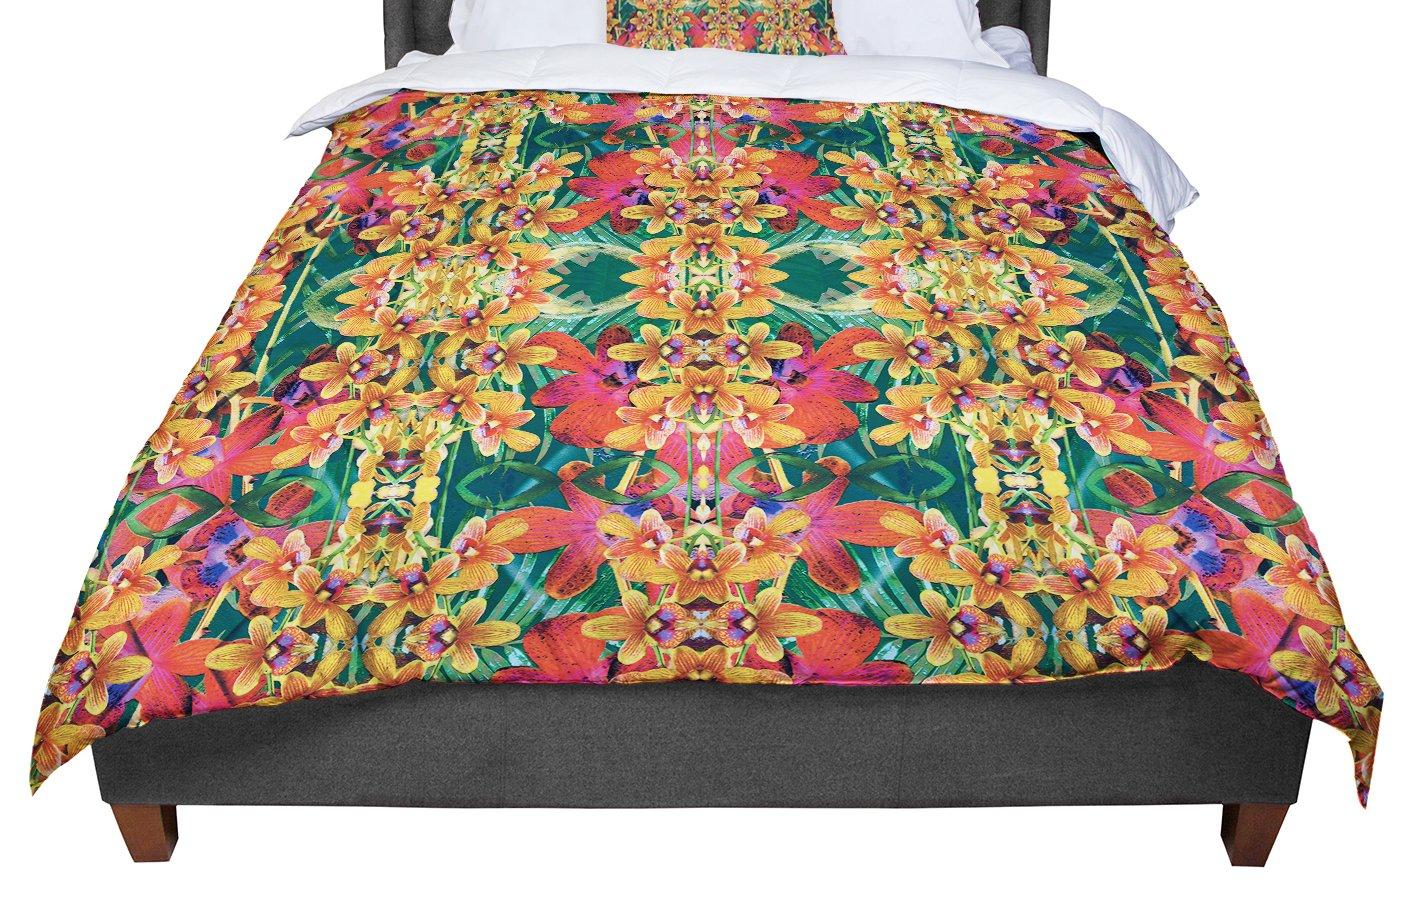 KESS InHouse Dawid Roc Tropical Floral Orange Pink Twin Comforter 68 X 88